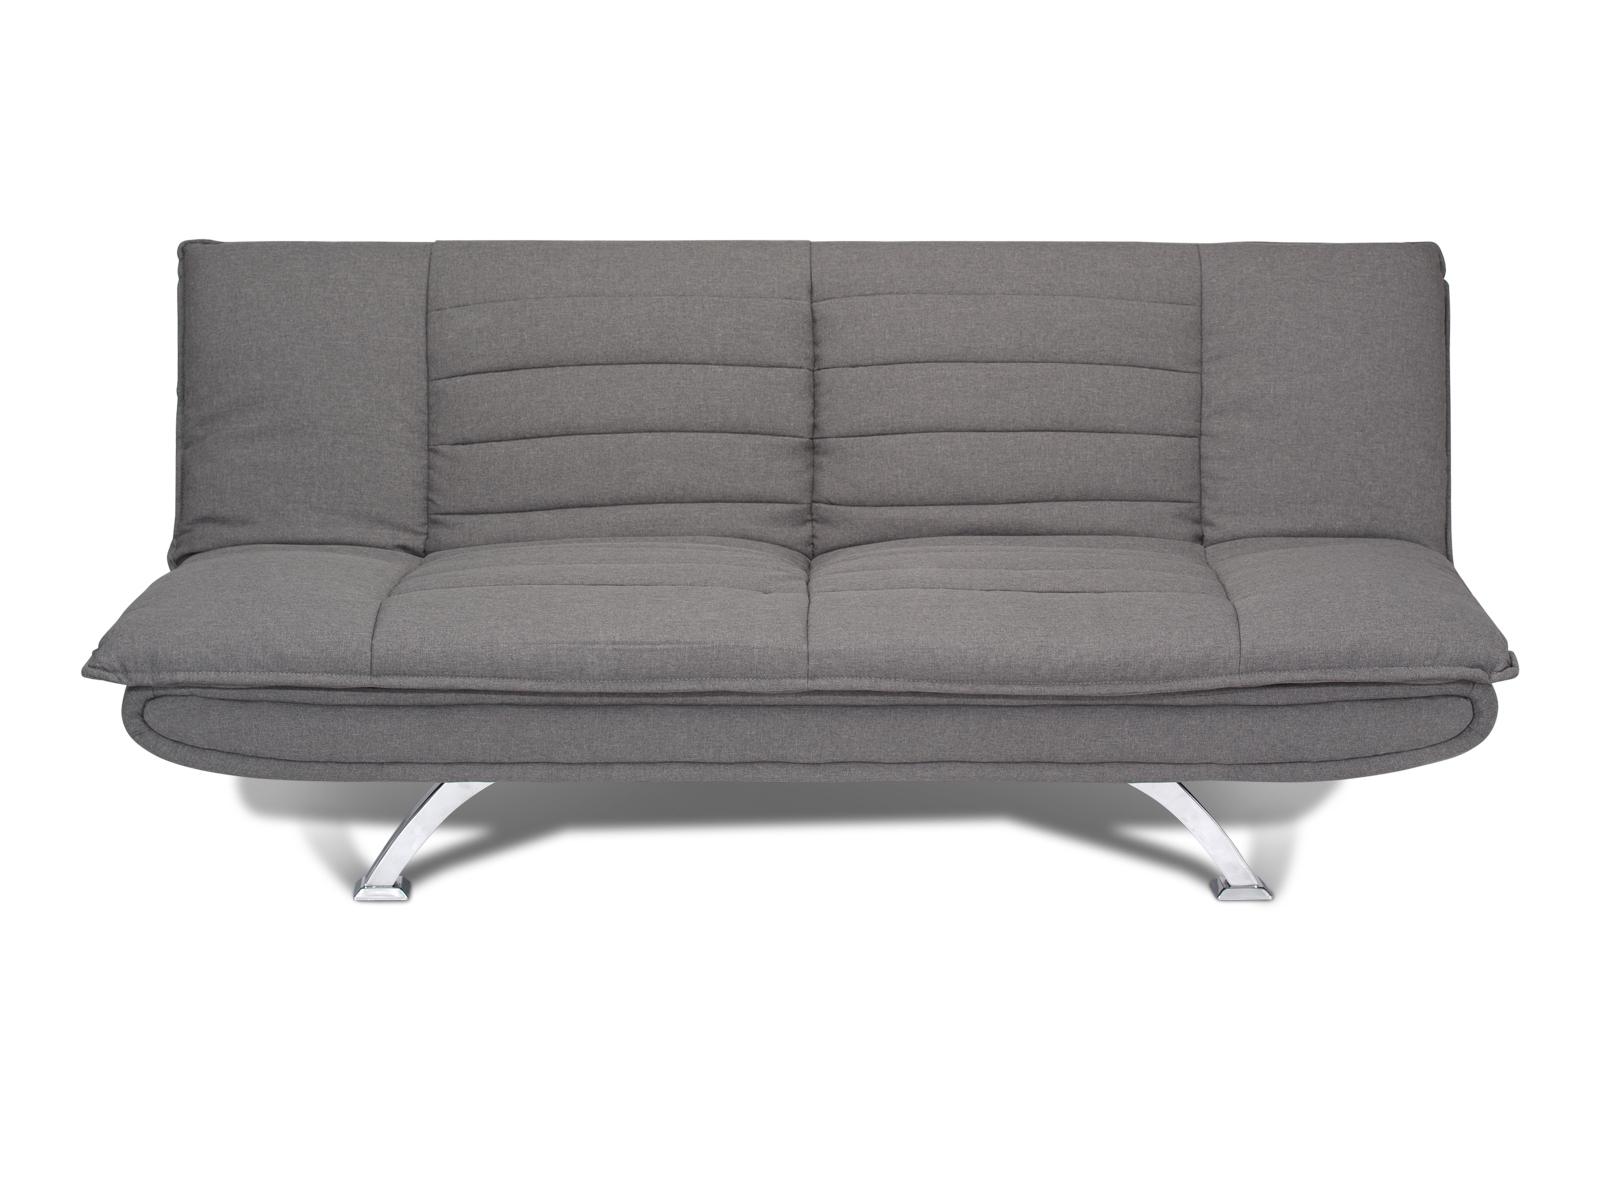 Canapea extensibila tapitata cu stofa 3 locuri Bart Grey l193xA102xH86 cm